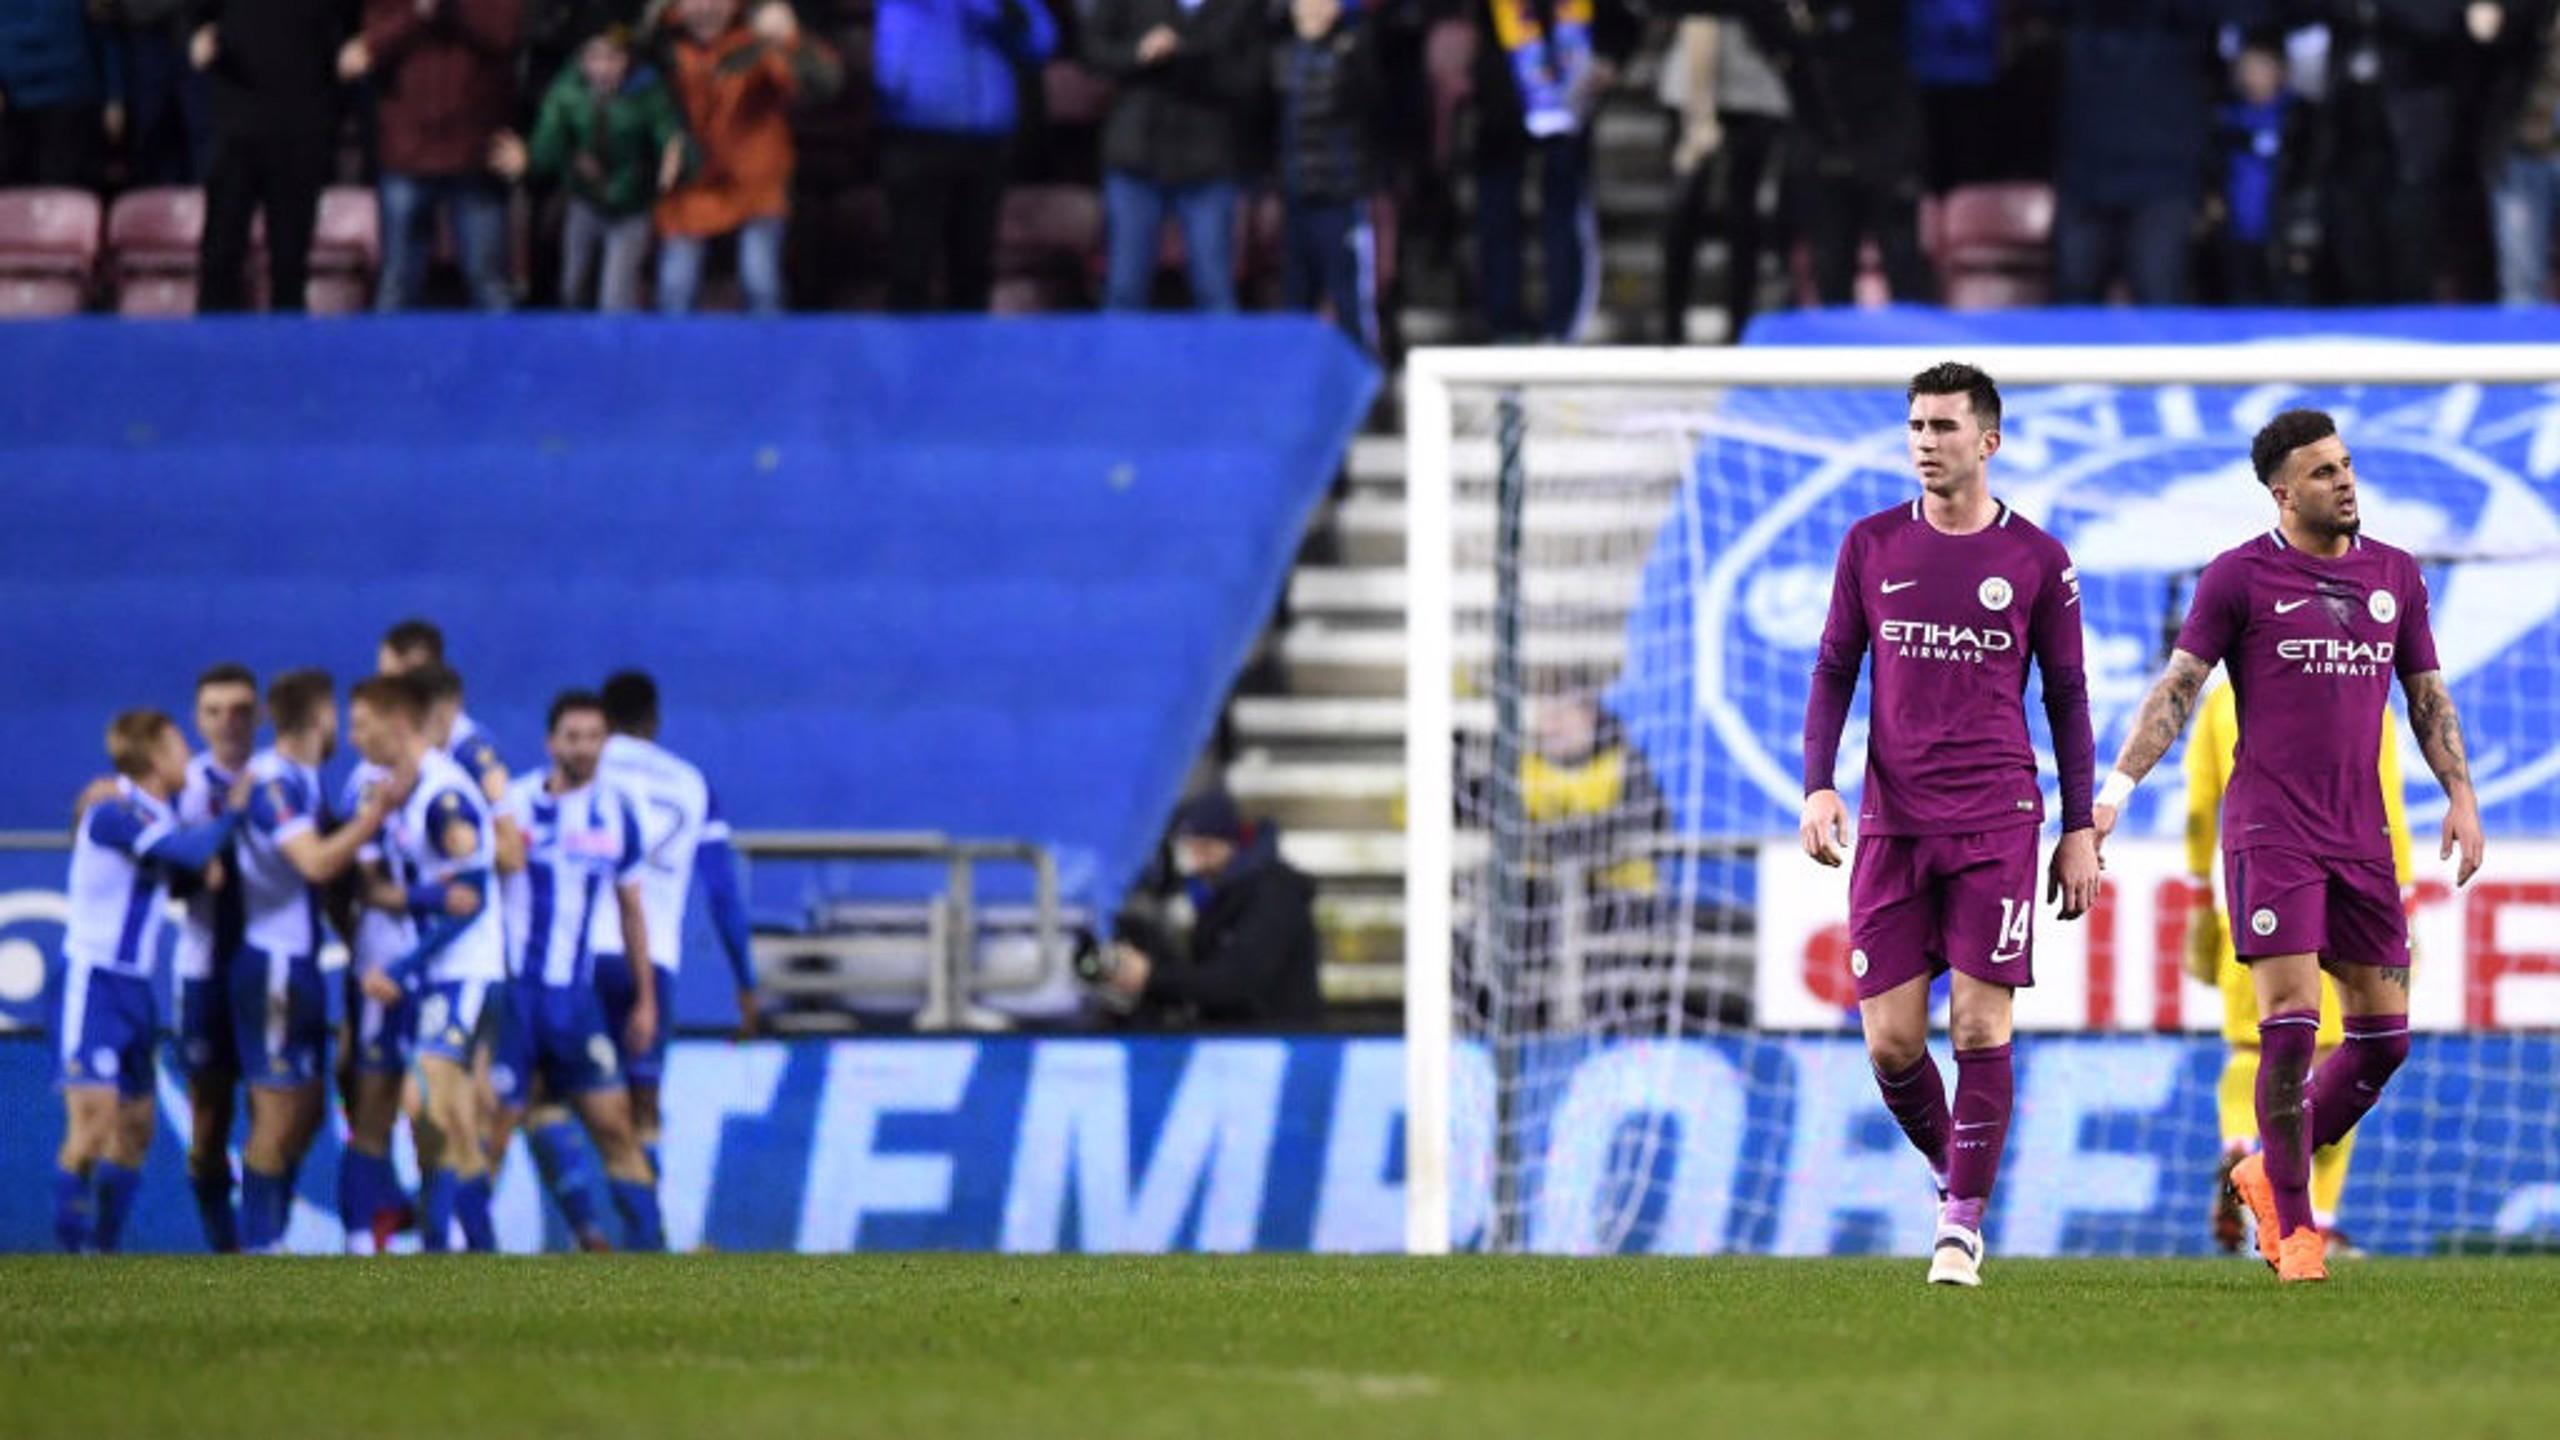 Wigan 1x0 Man City